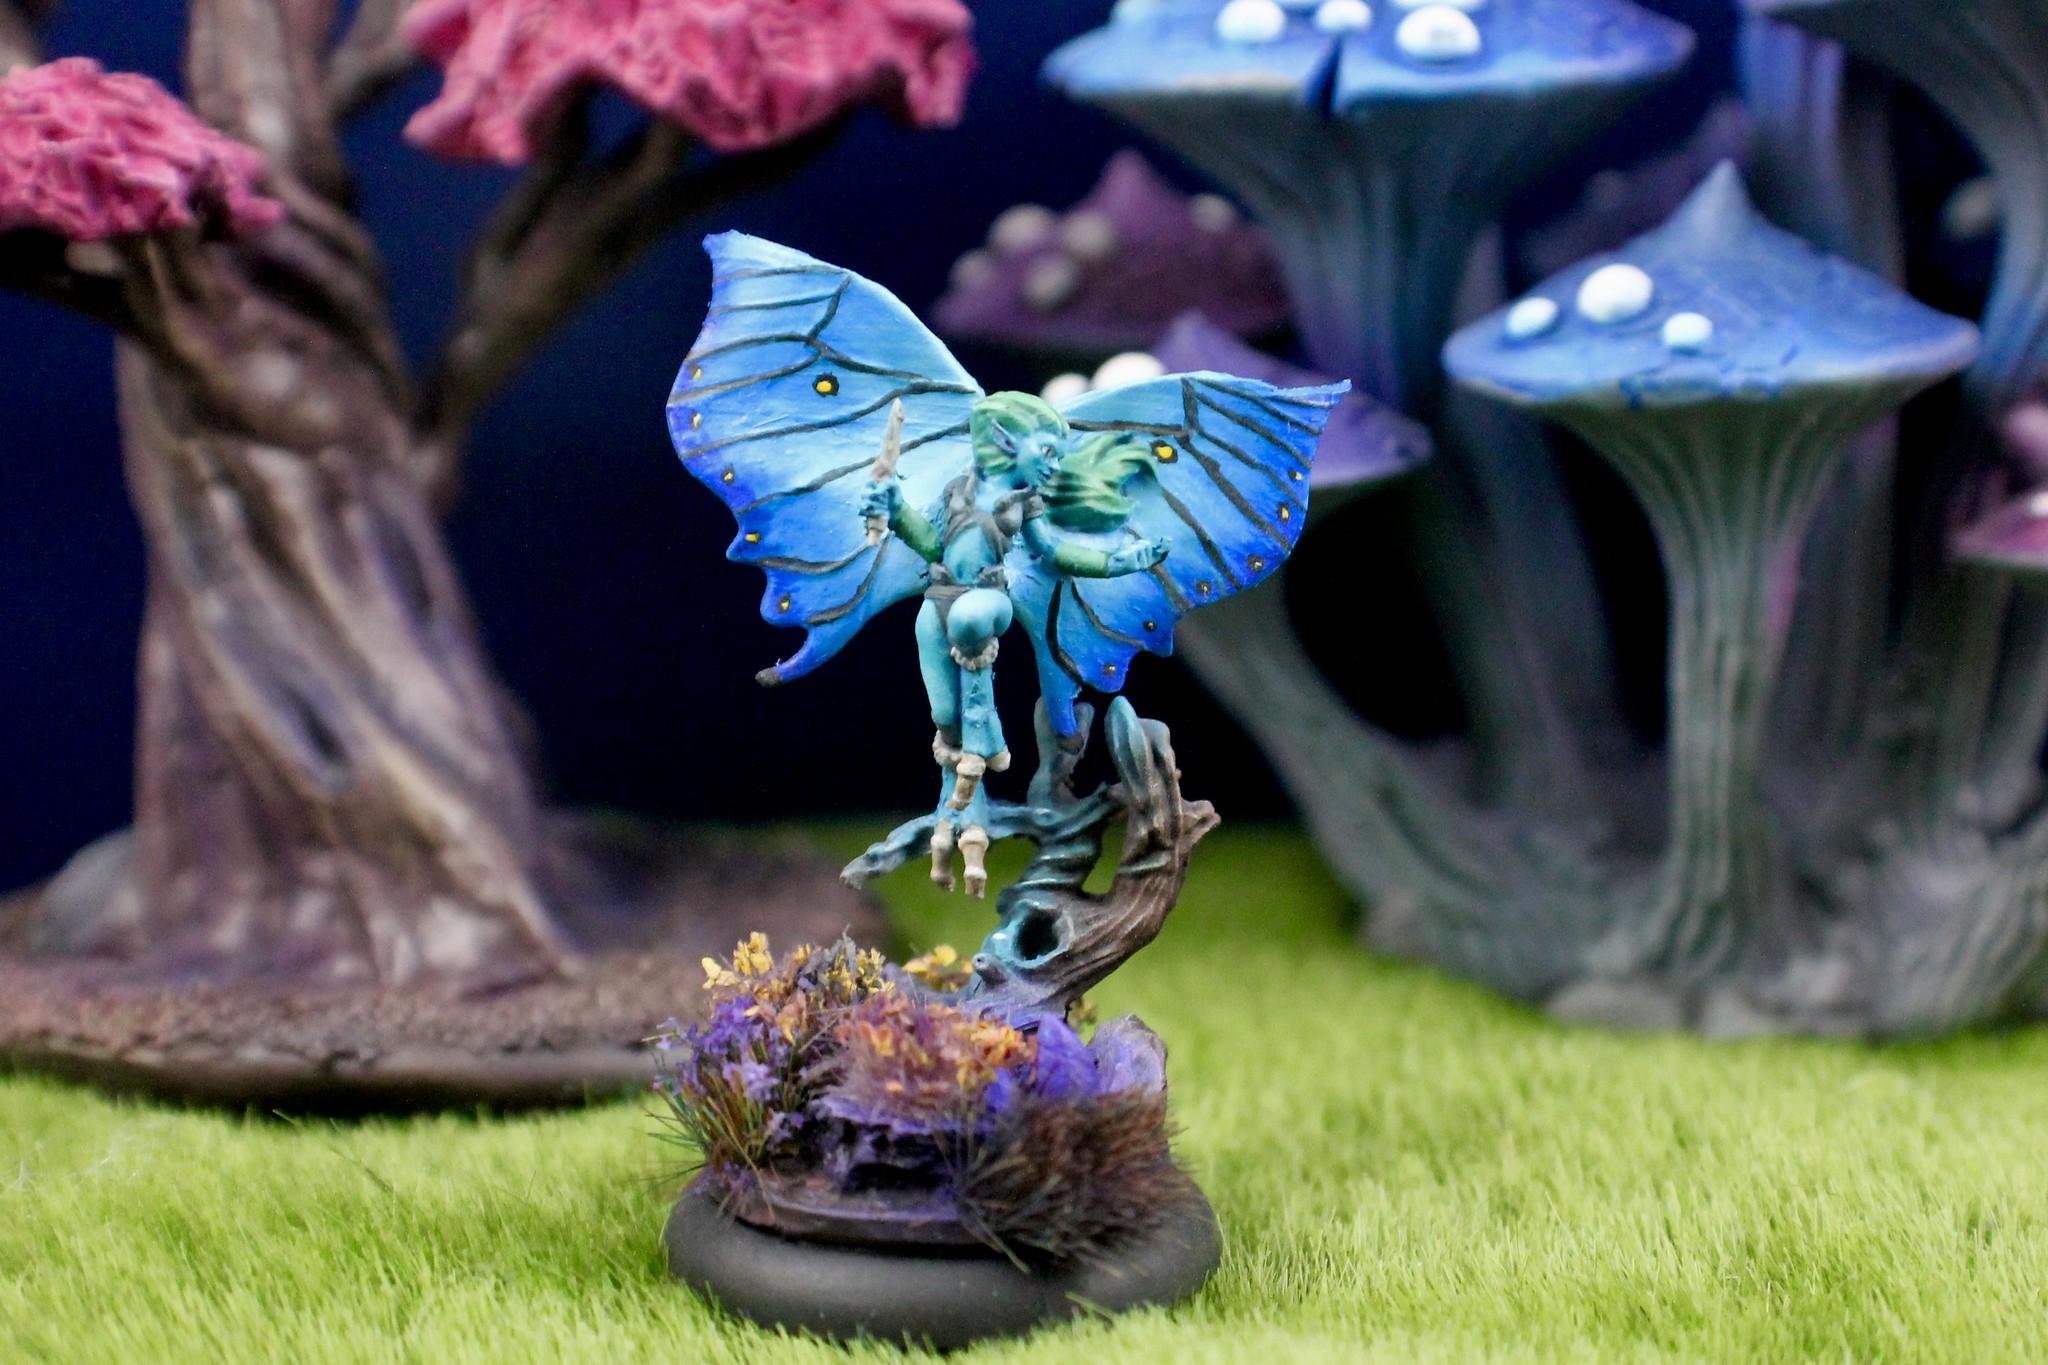 Teetoe faerie moonstone the game